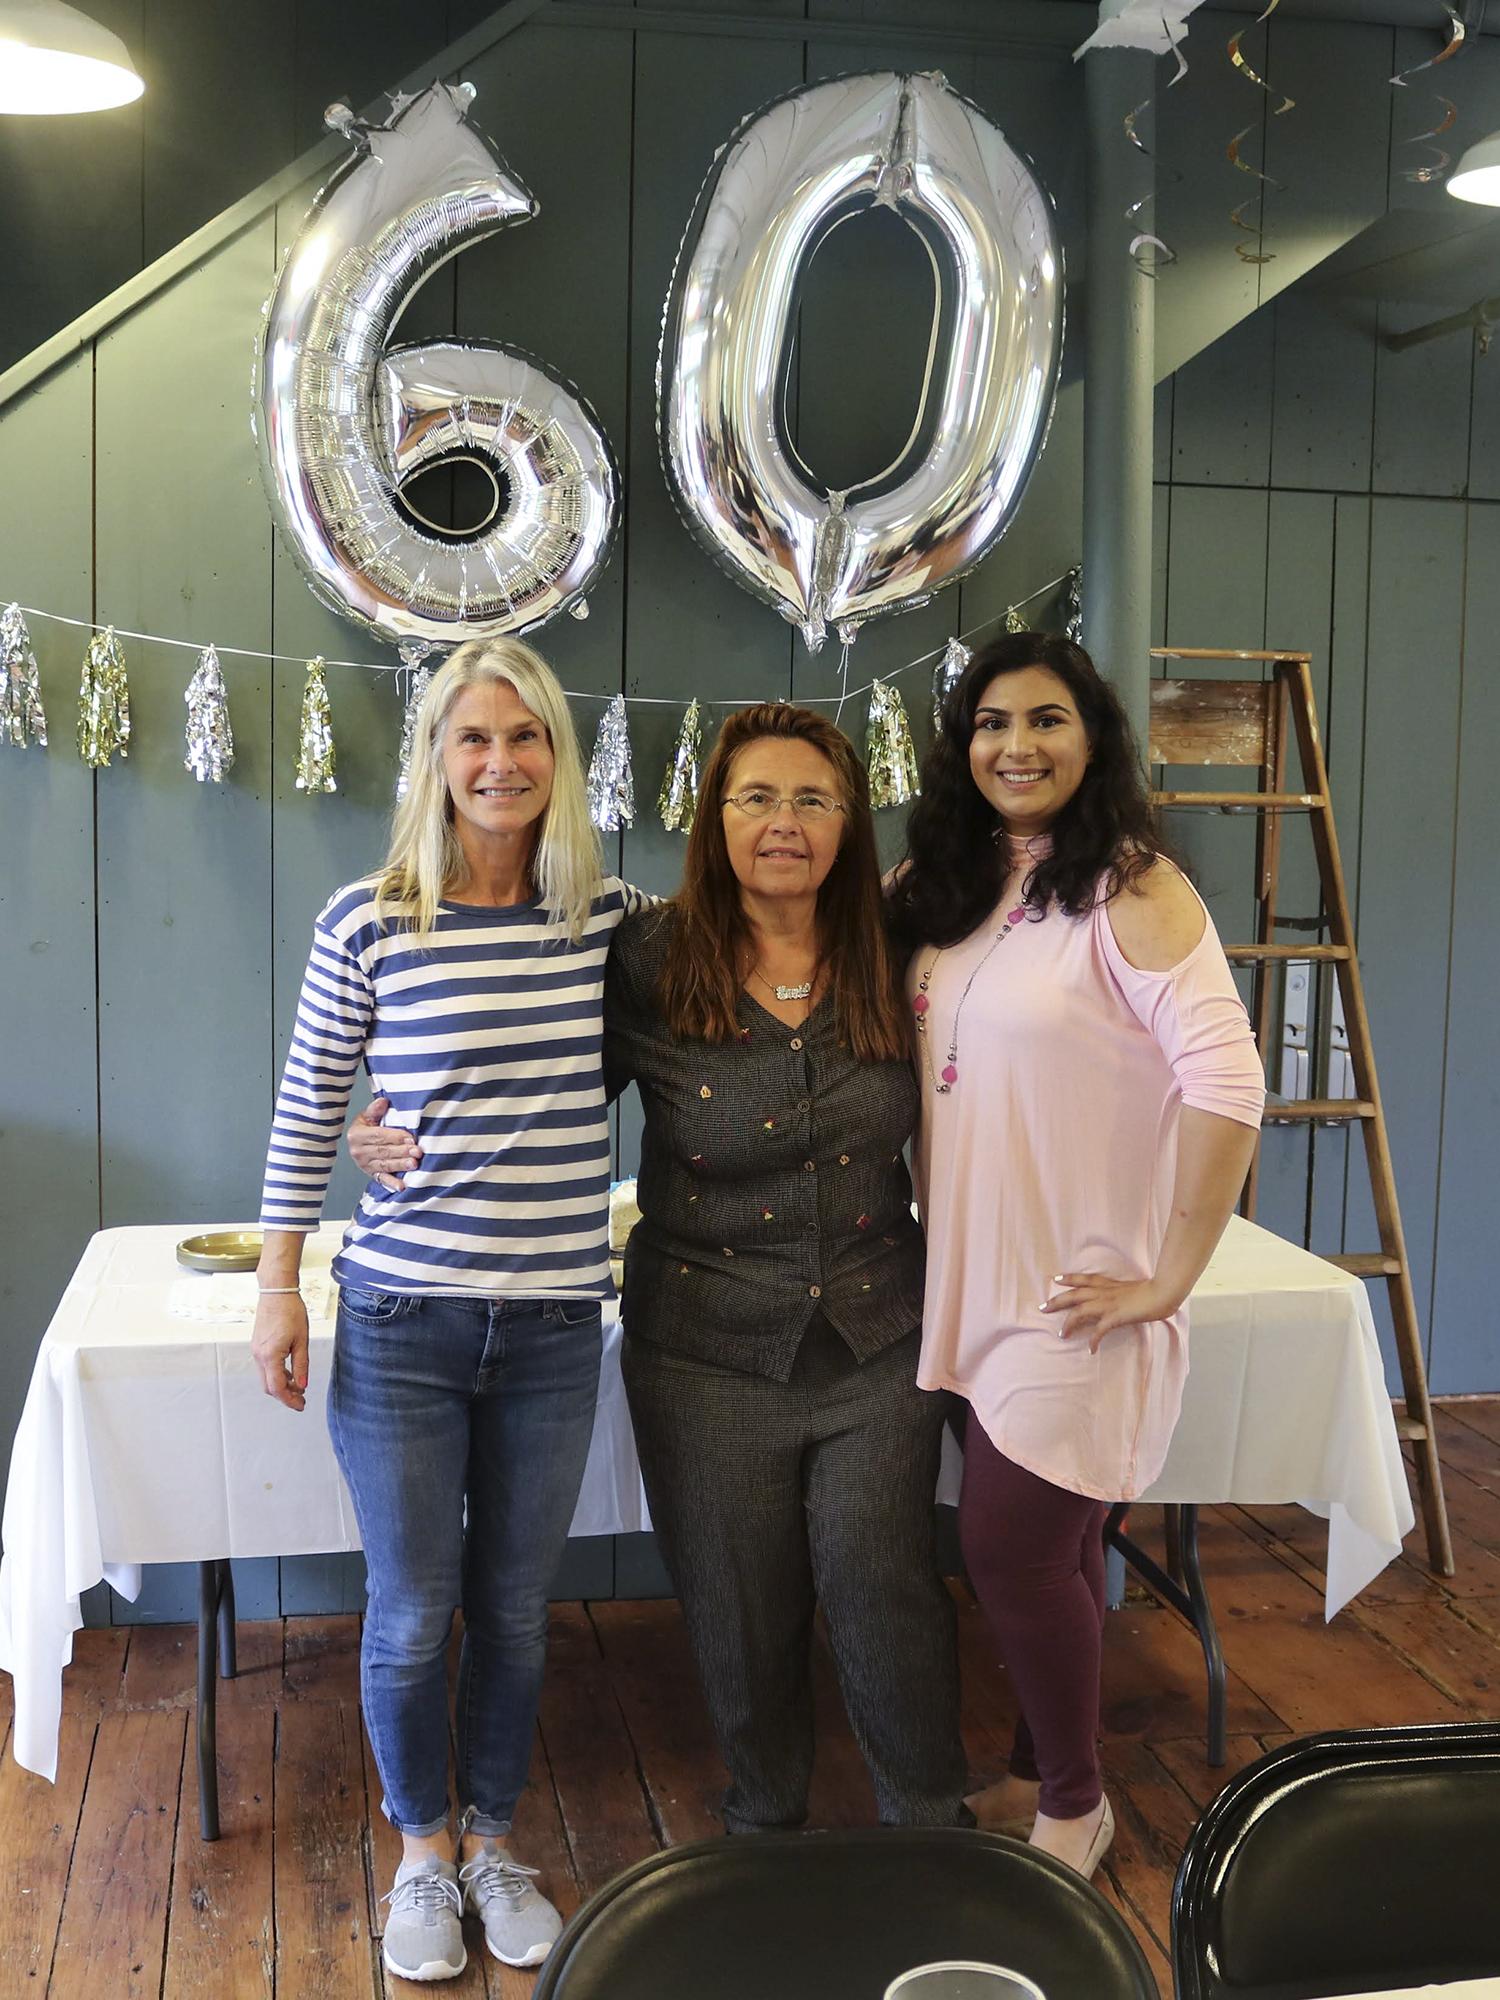 Lisa Walker, Jamie Pednioff and Shreya Kachroo